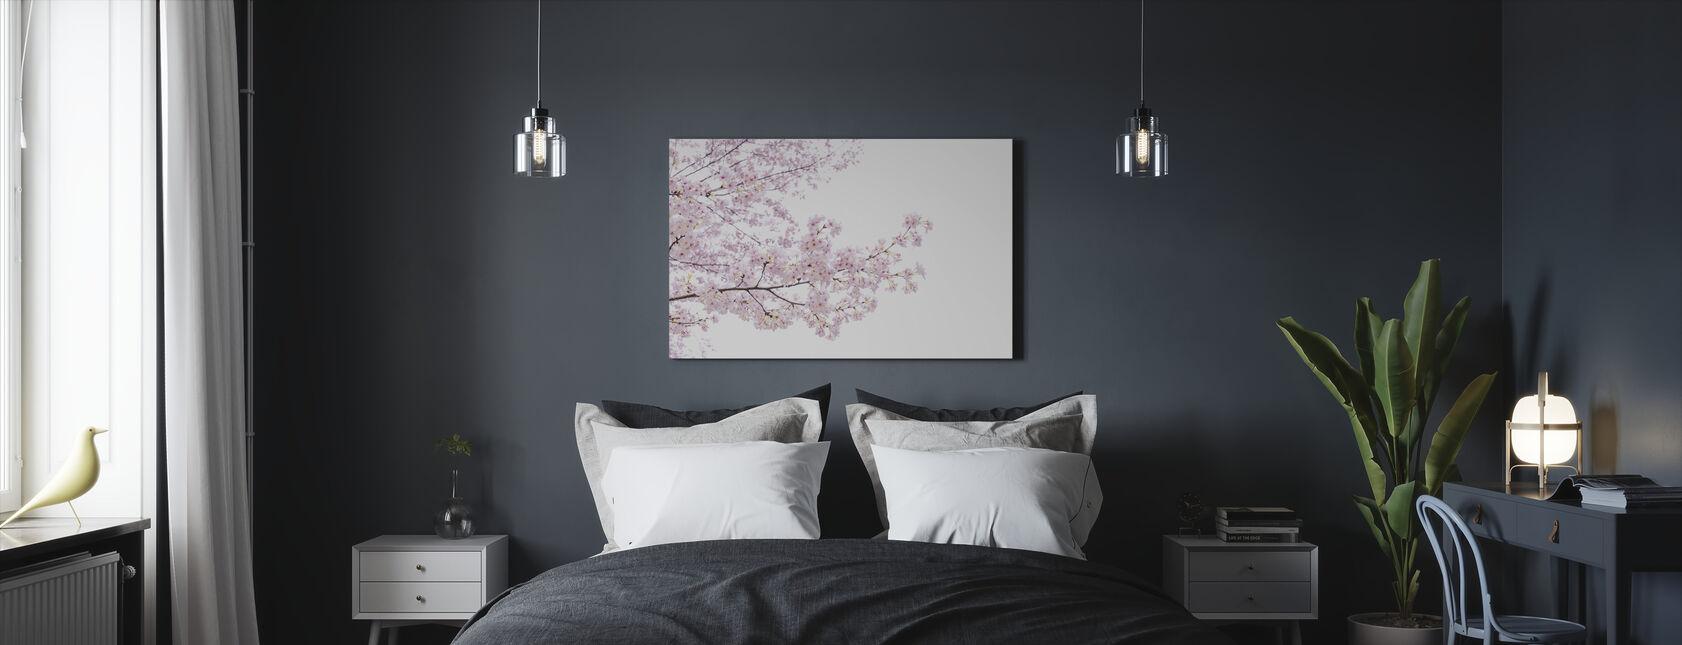 Divine Cherry Blossoms - Canvas print - Bedroom